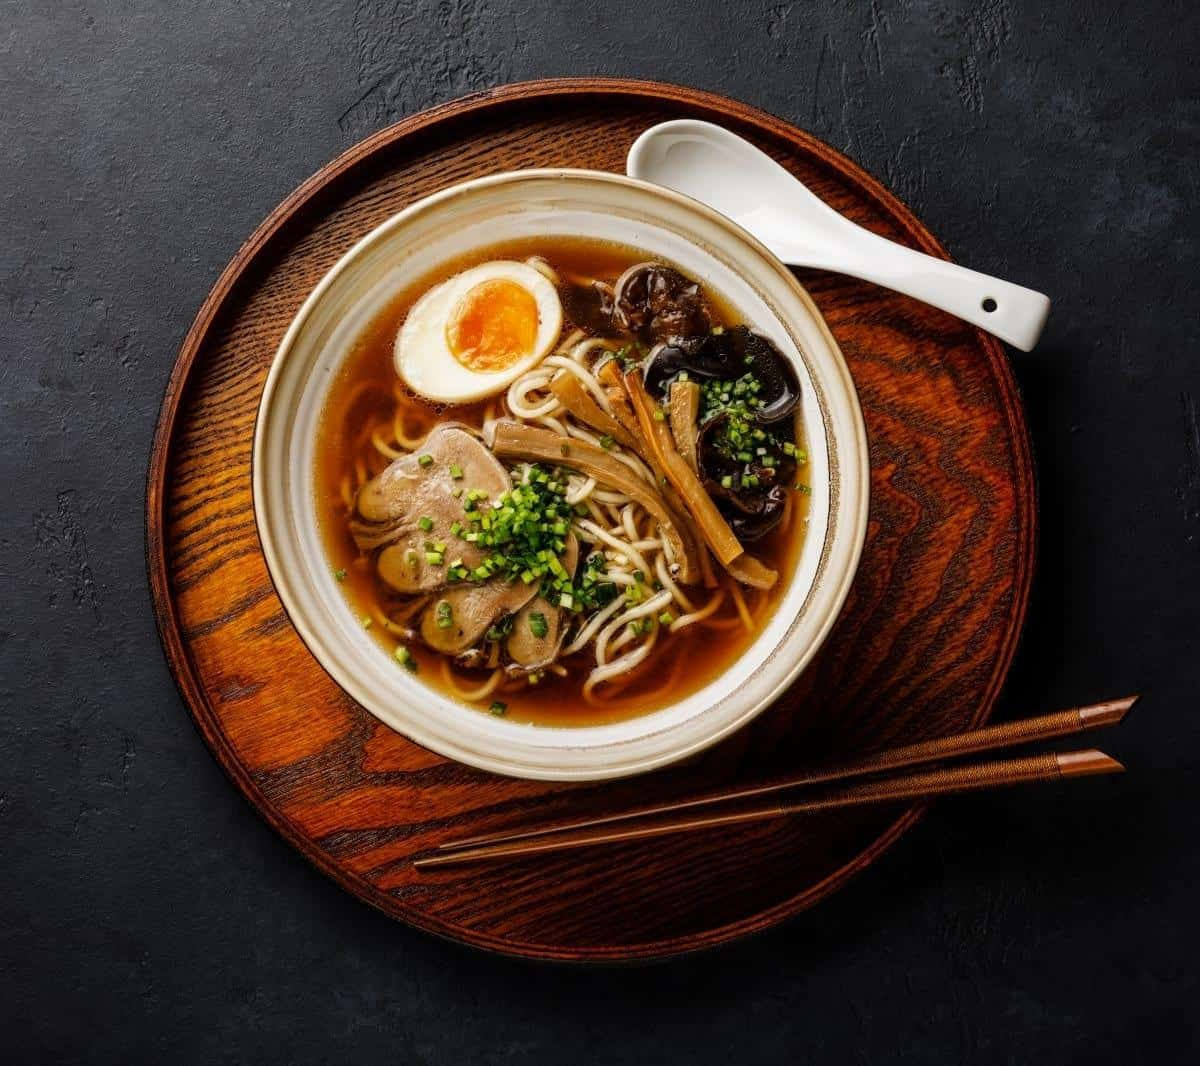 Ramen and egg noodles